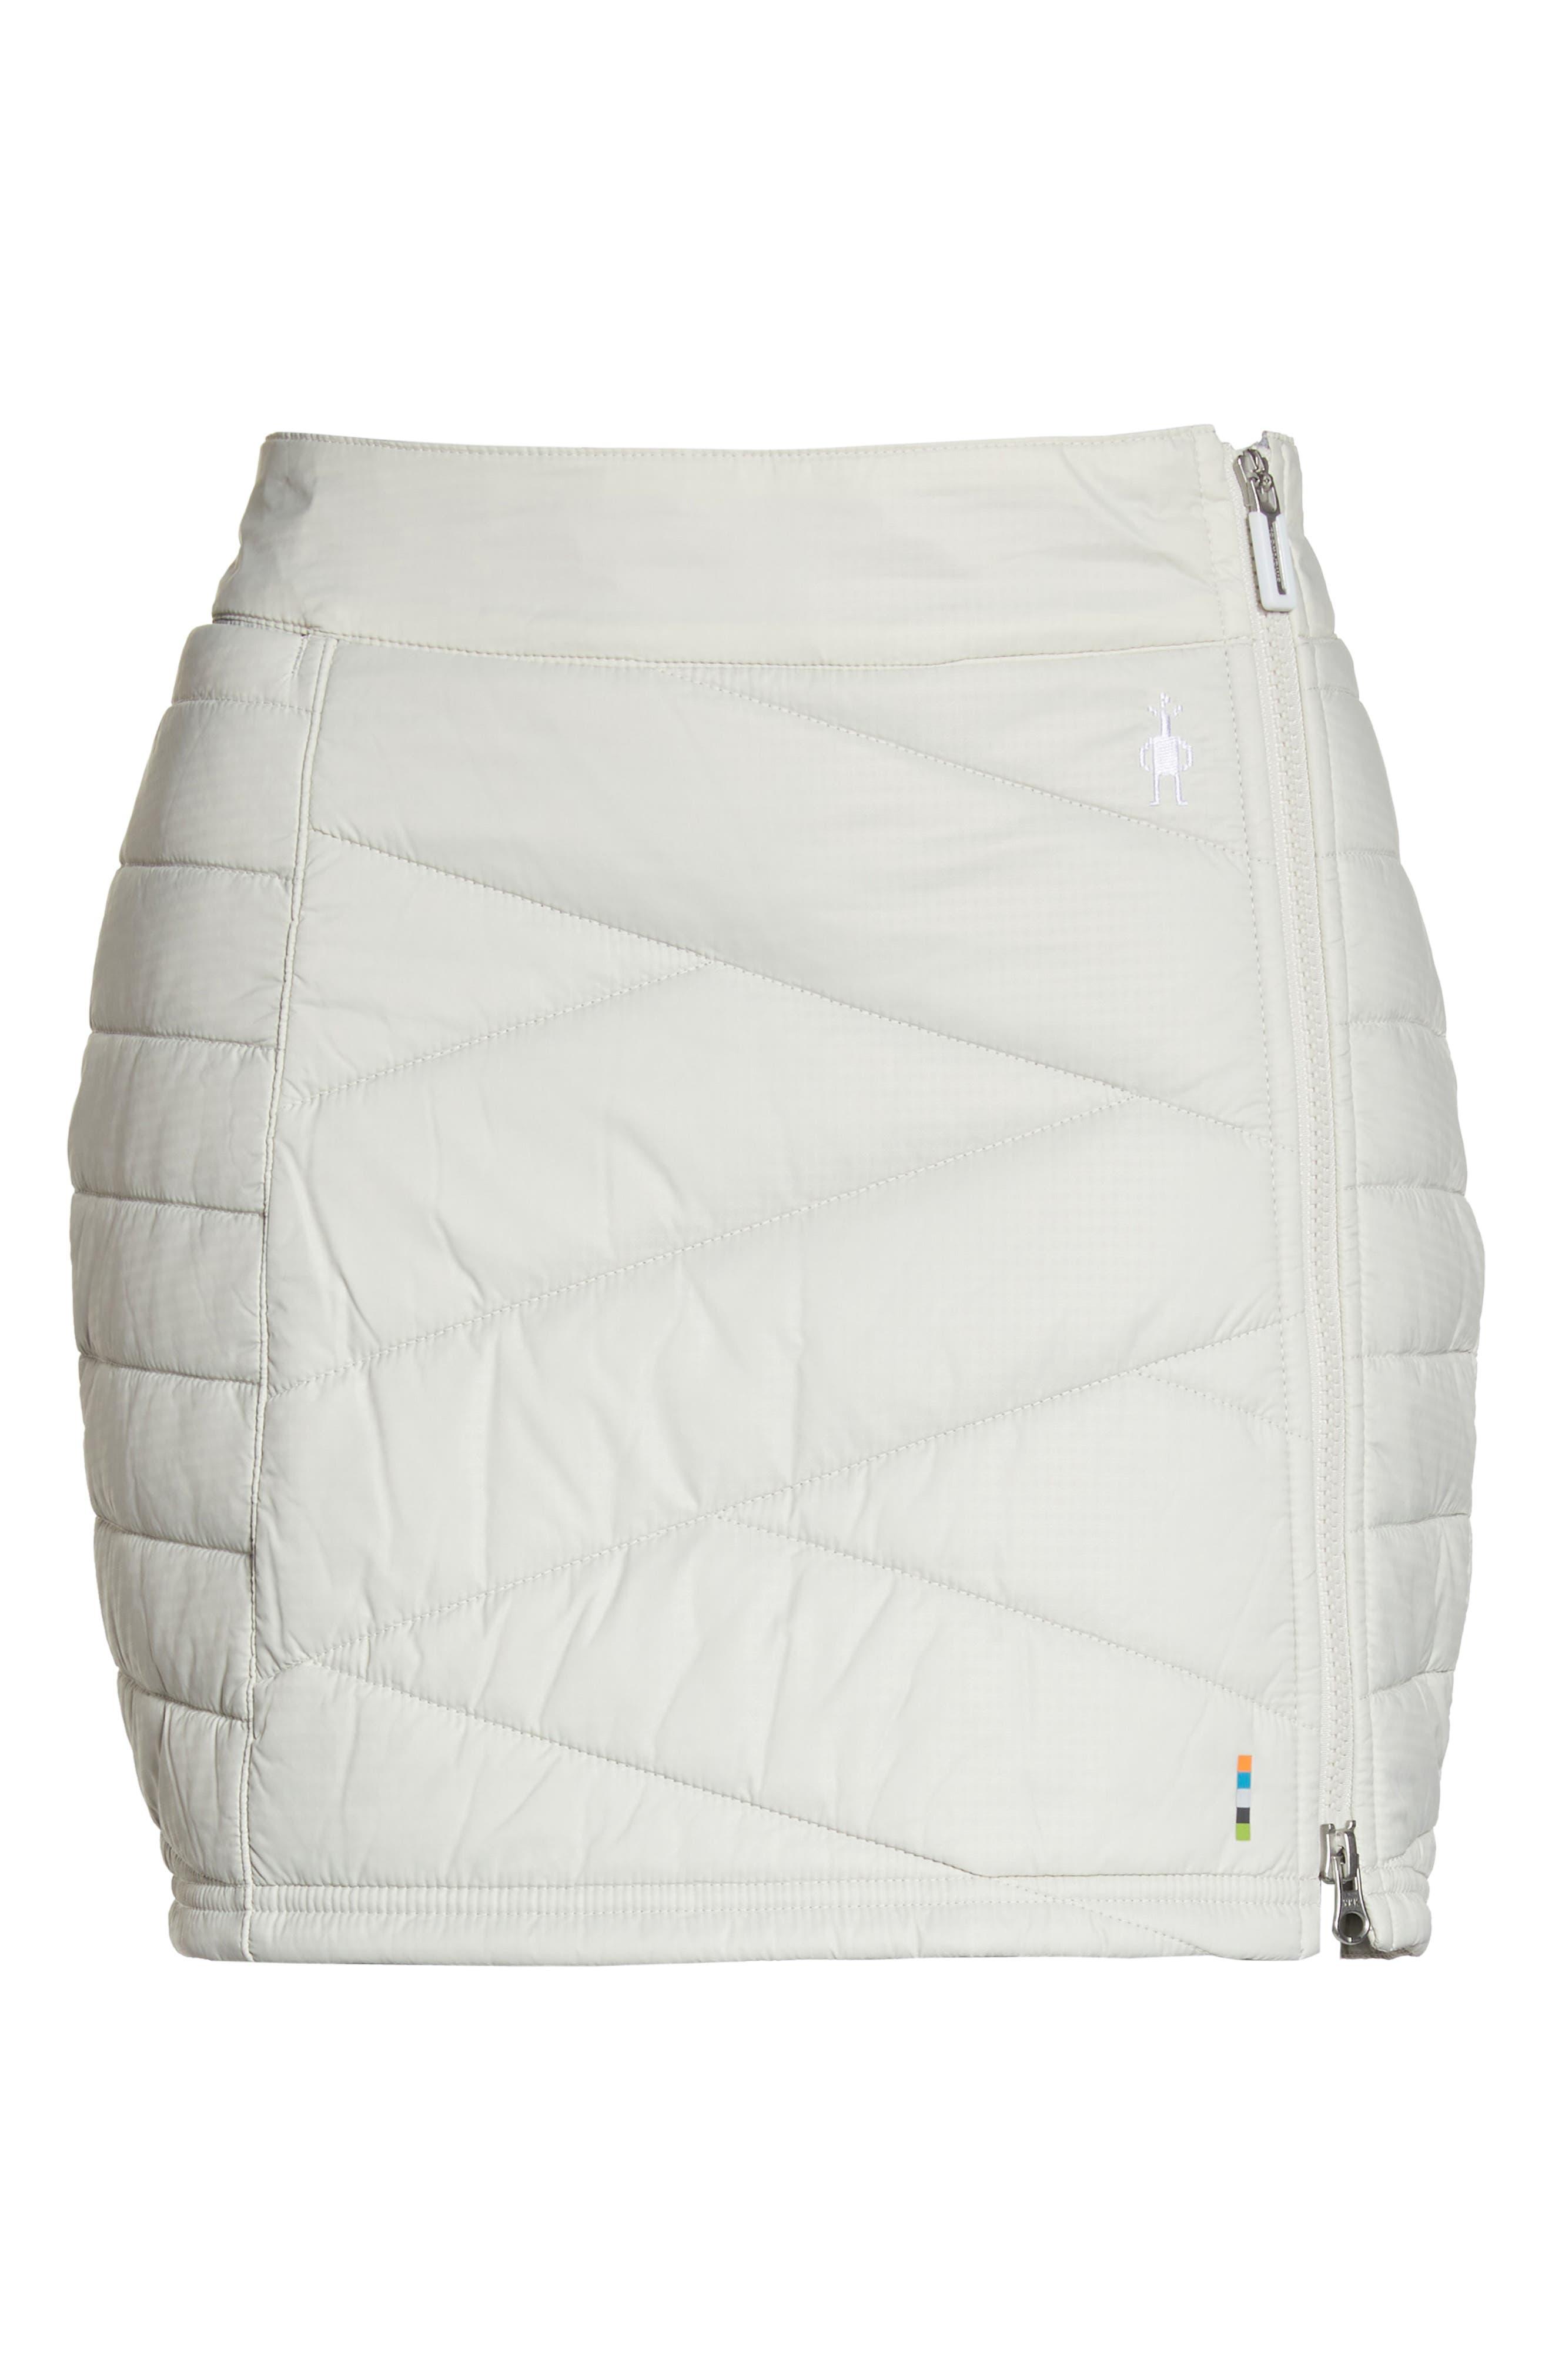 SMARTWOOL,                             Smartloft 120 Quilted Skirt,                             Alternate thumbnail 6, color,                             025